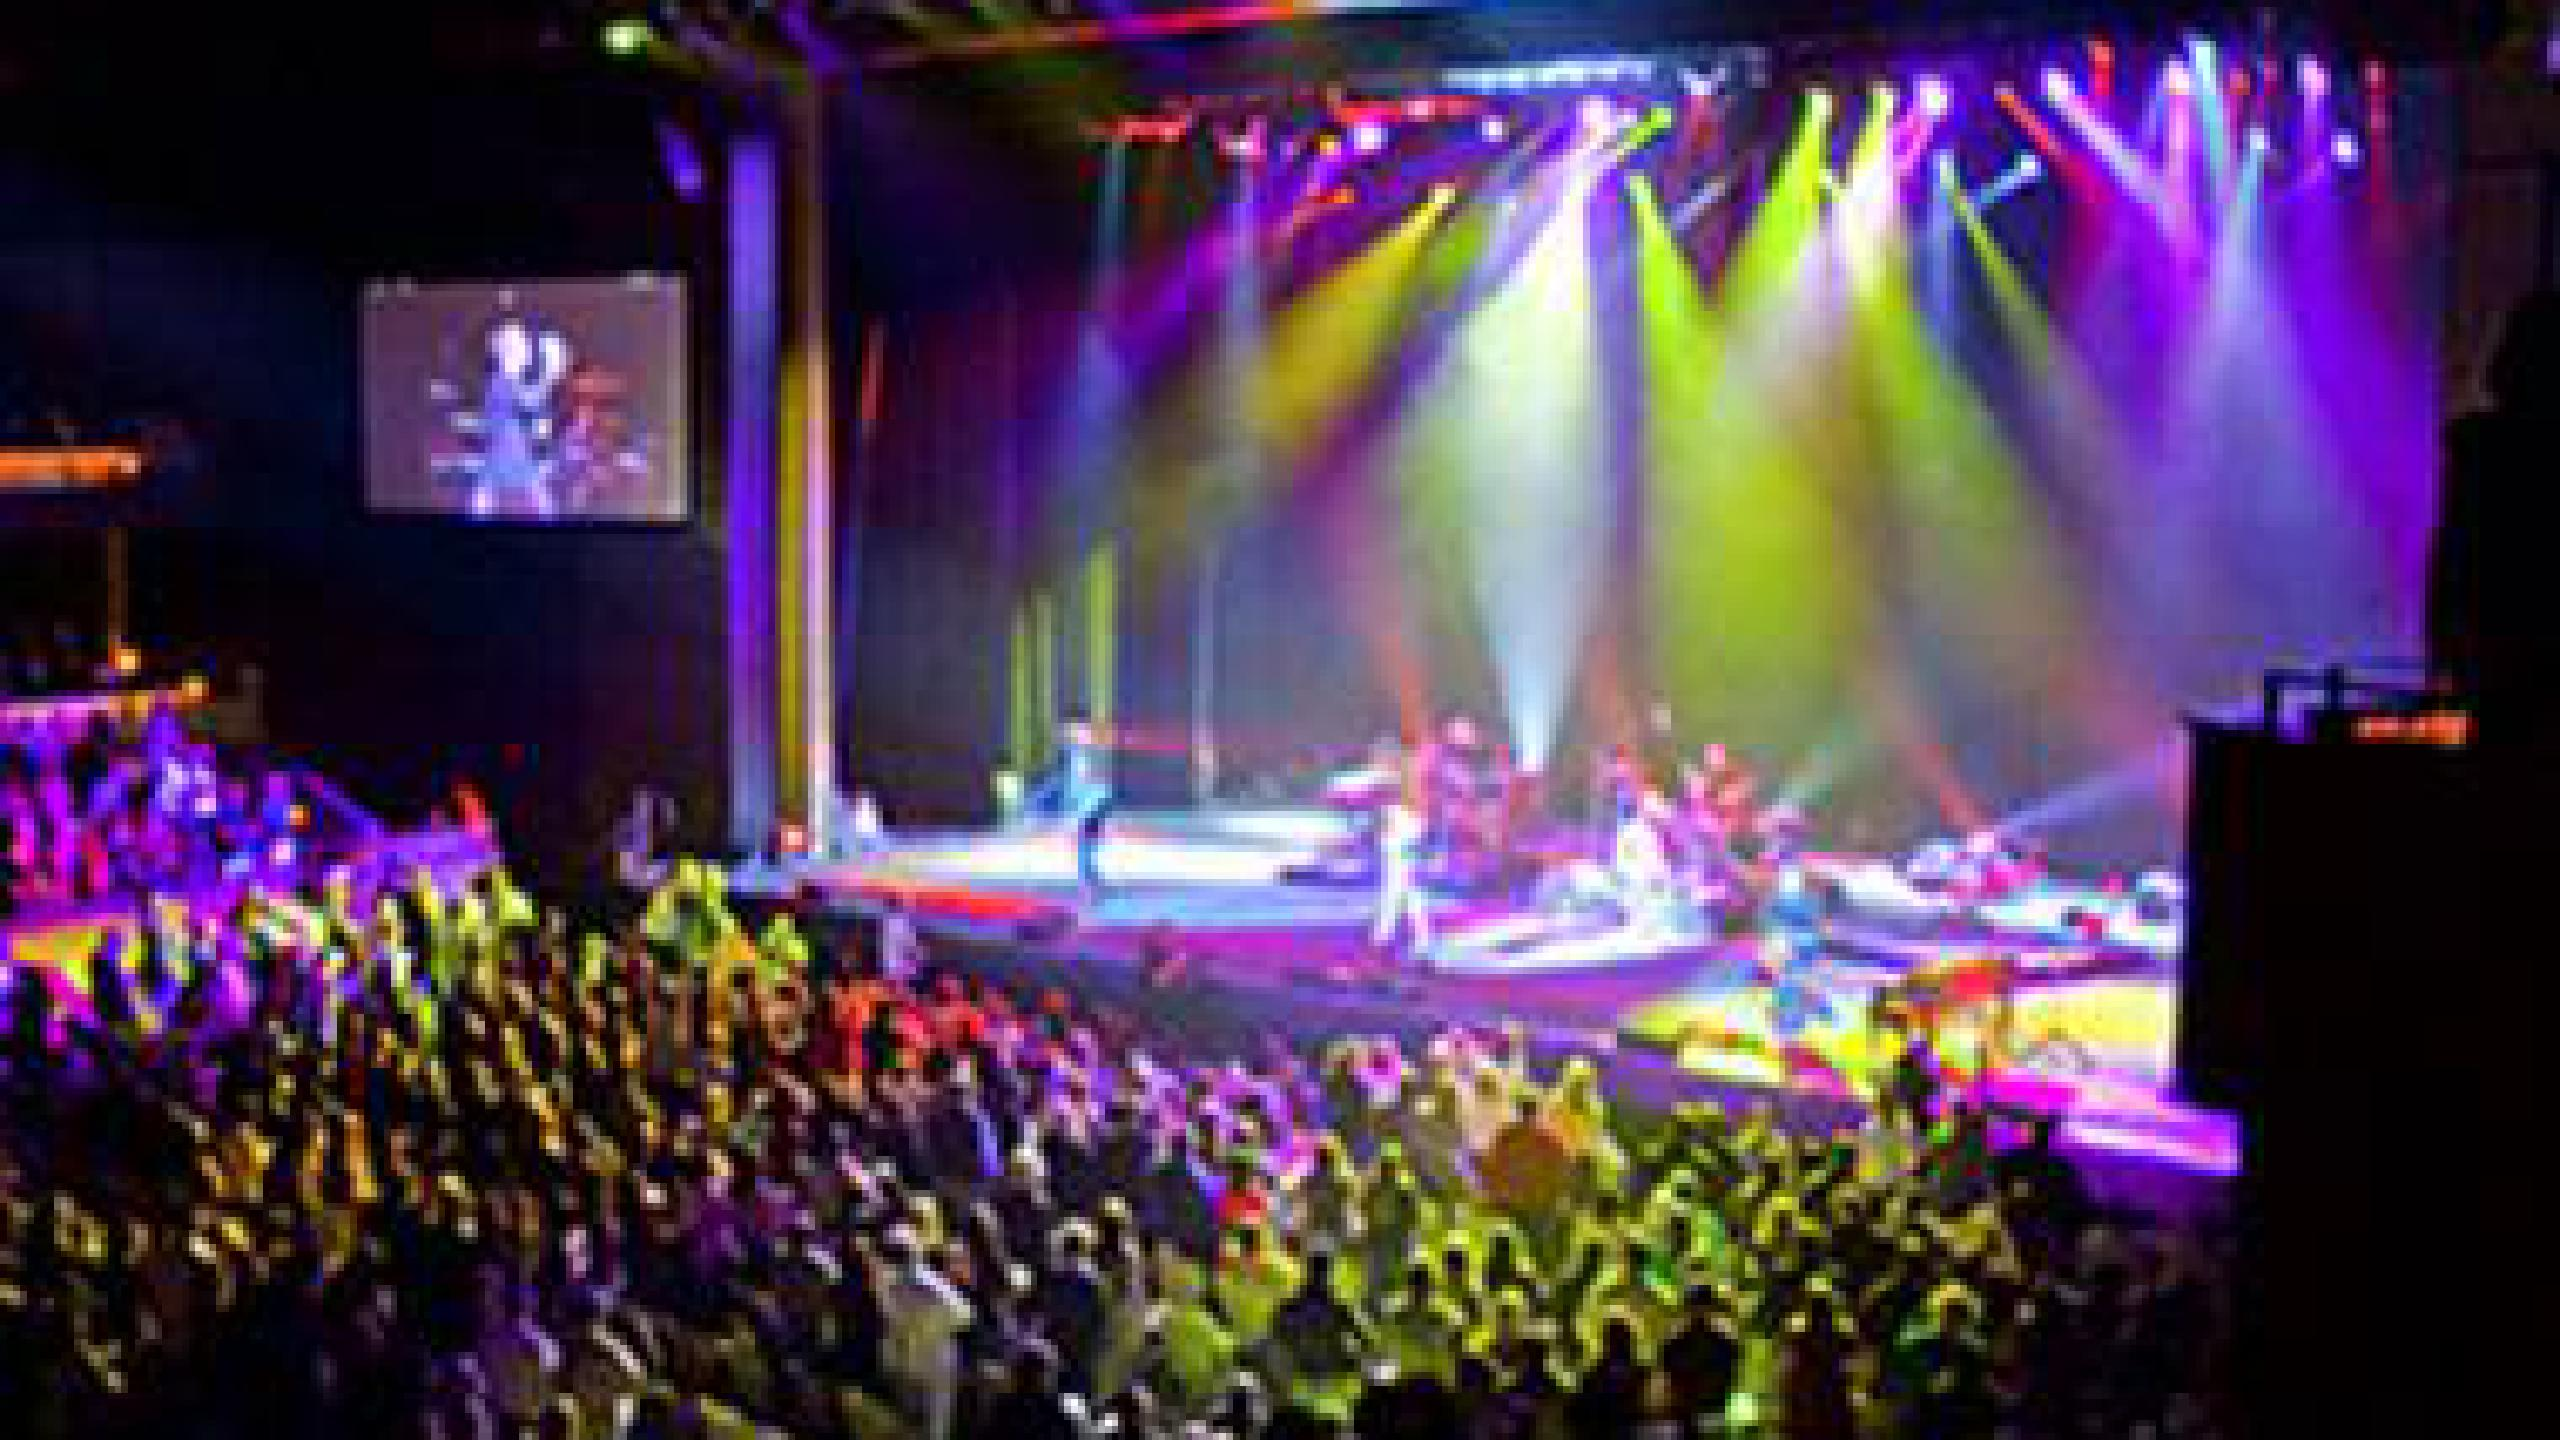 Morongo casino concert venue bioshock 2 ps3 game review